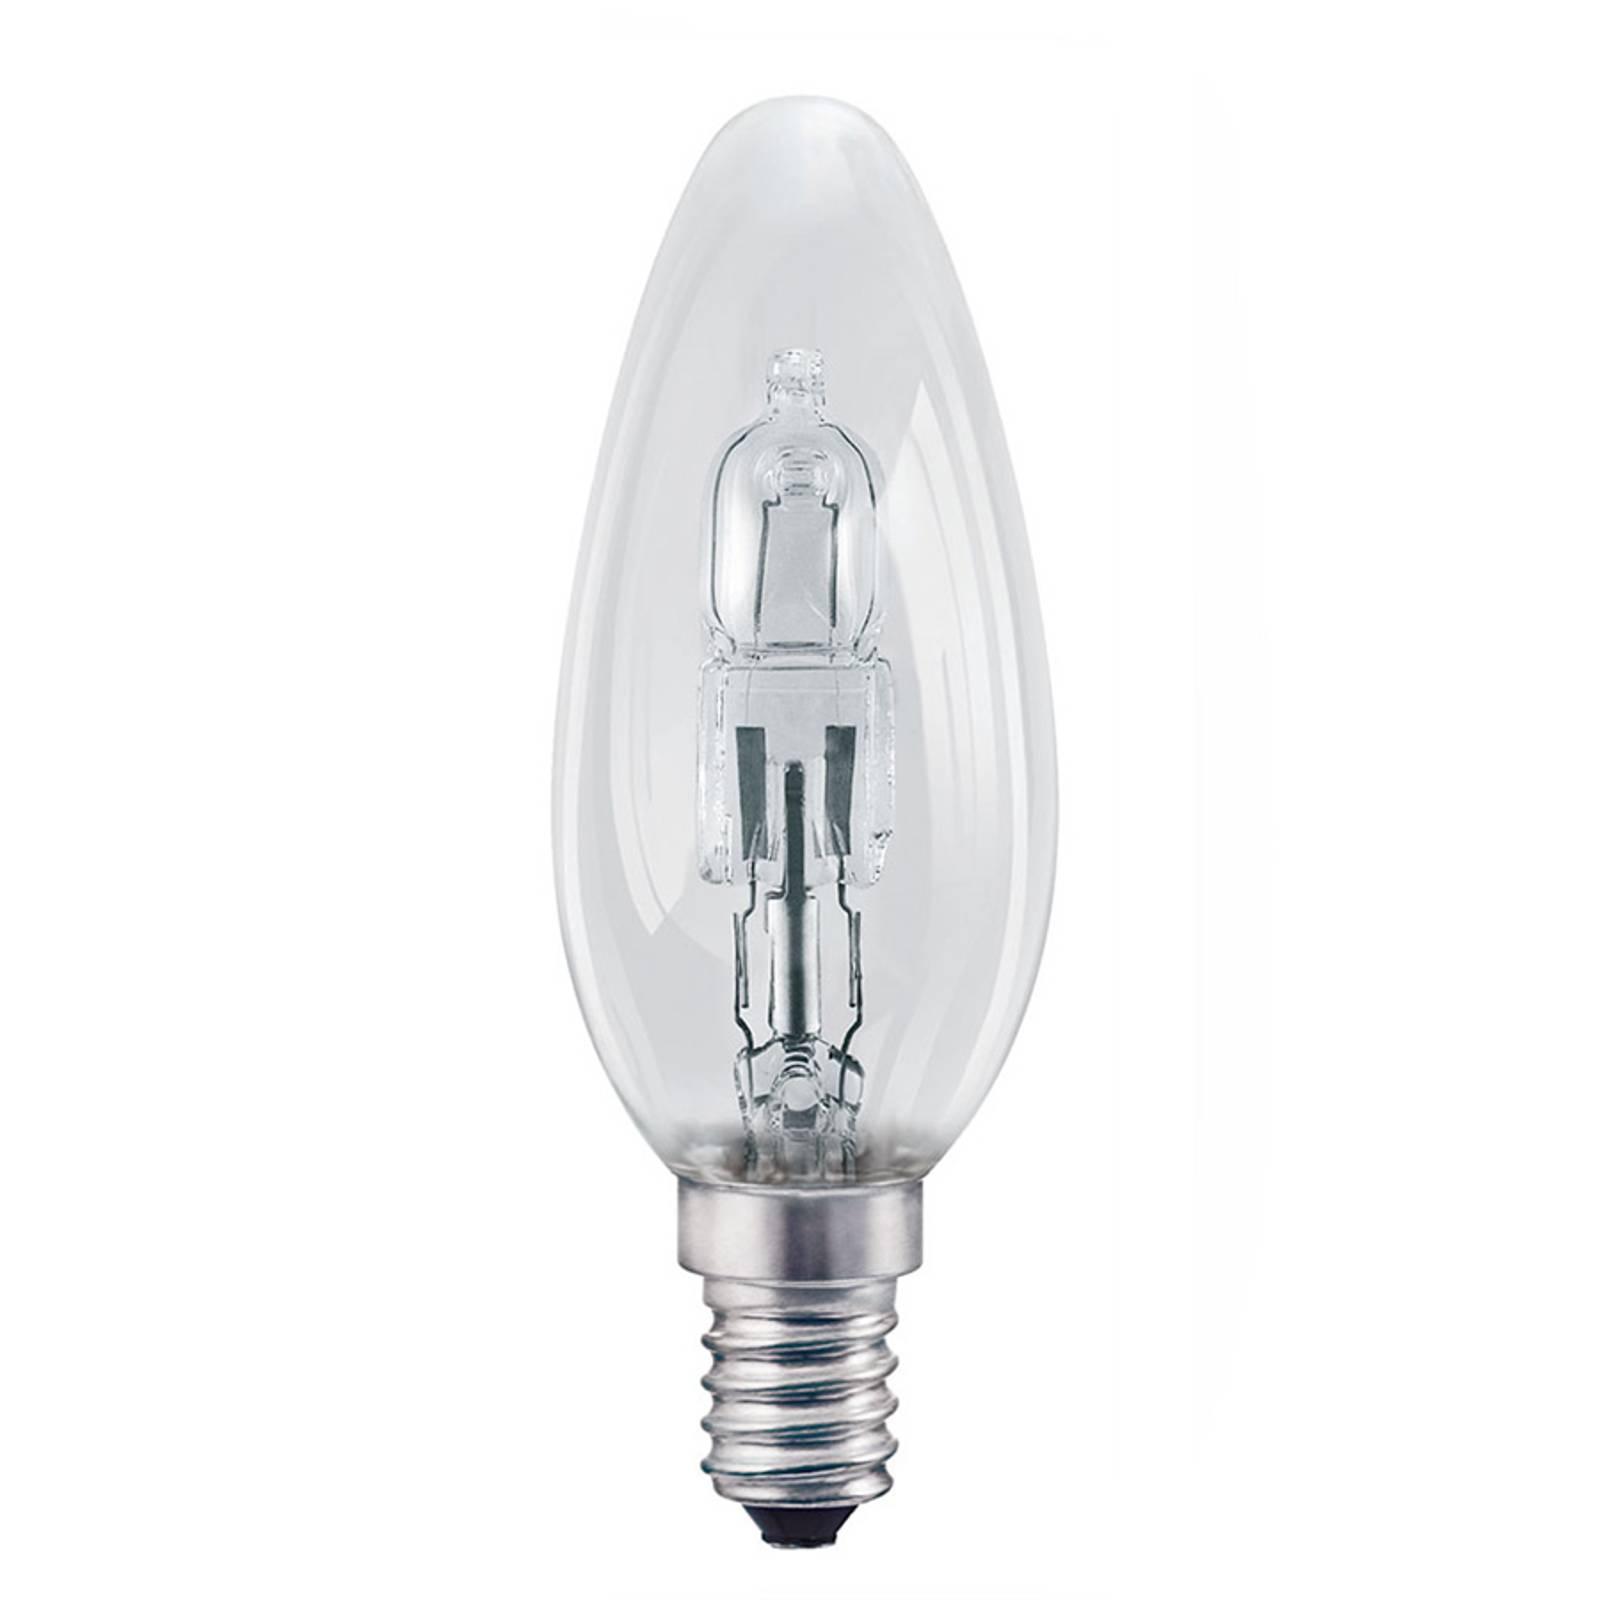 E14 20 W kirkas halogeenilamppu Classic B kynttilä